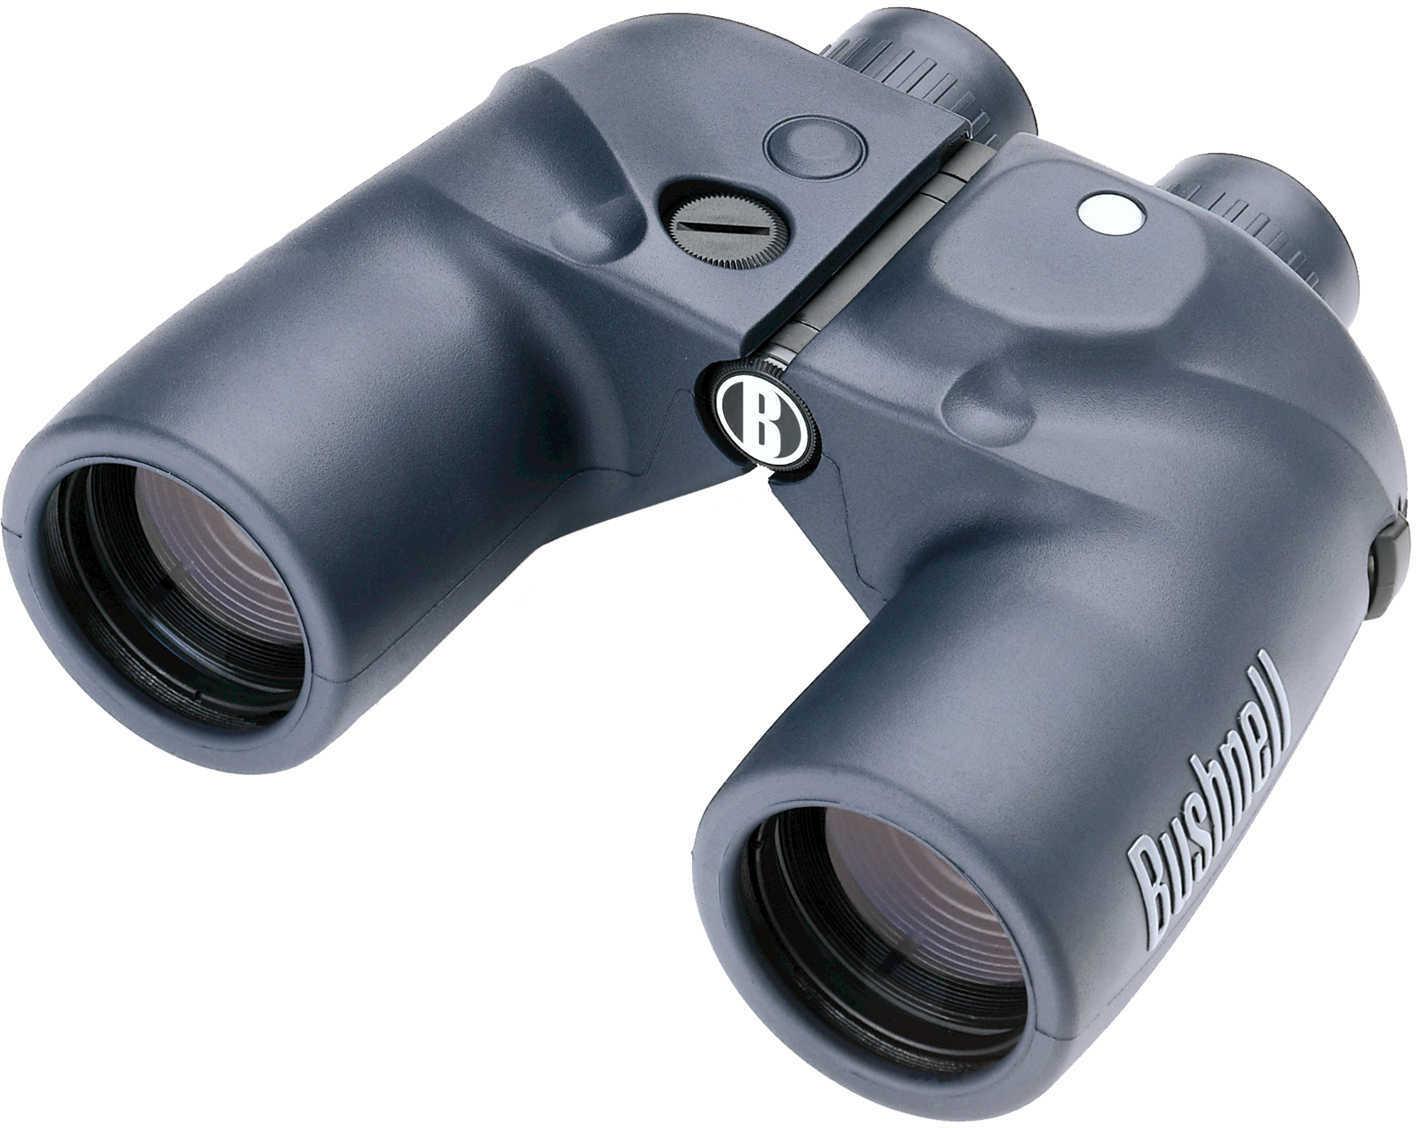 Bushnell 7X50mm Waterproof & Fogproof Compact Binoculars With Bak4 Porro Prism Md: 137500